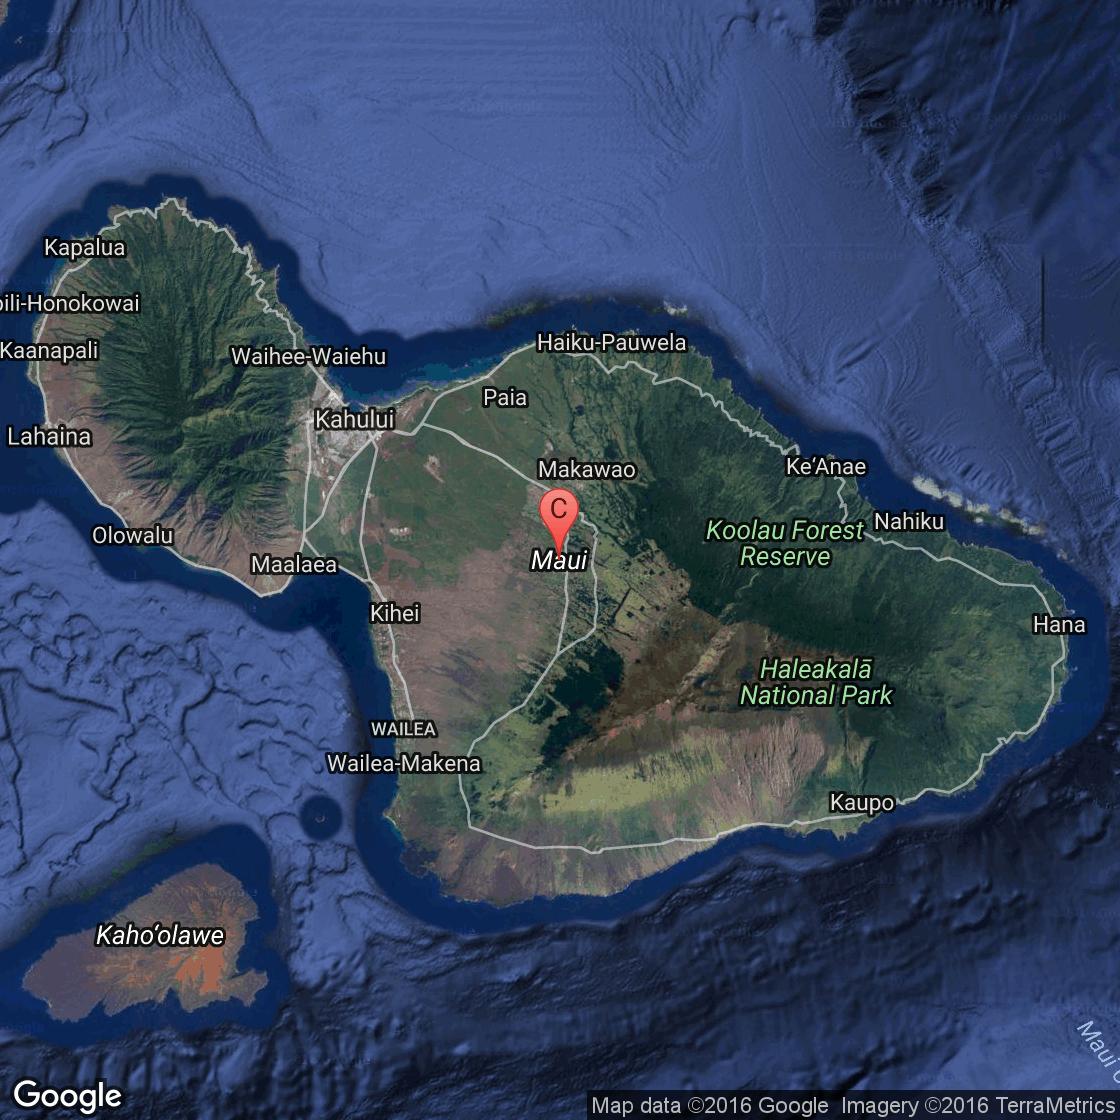 Maui Island Google Map